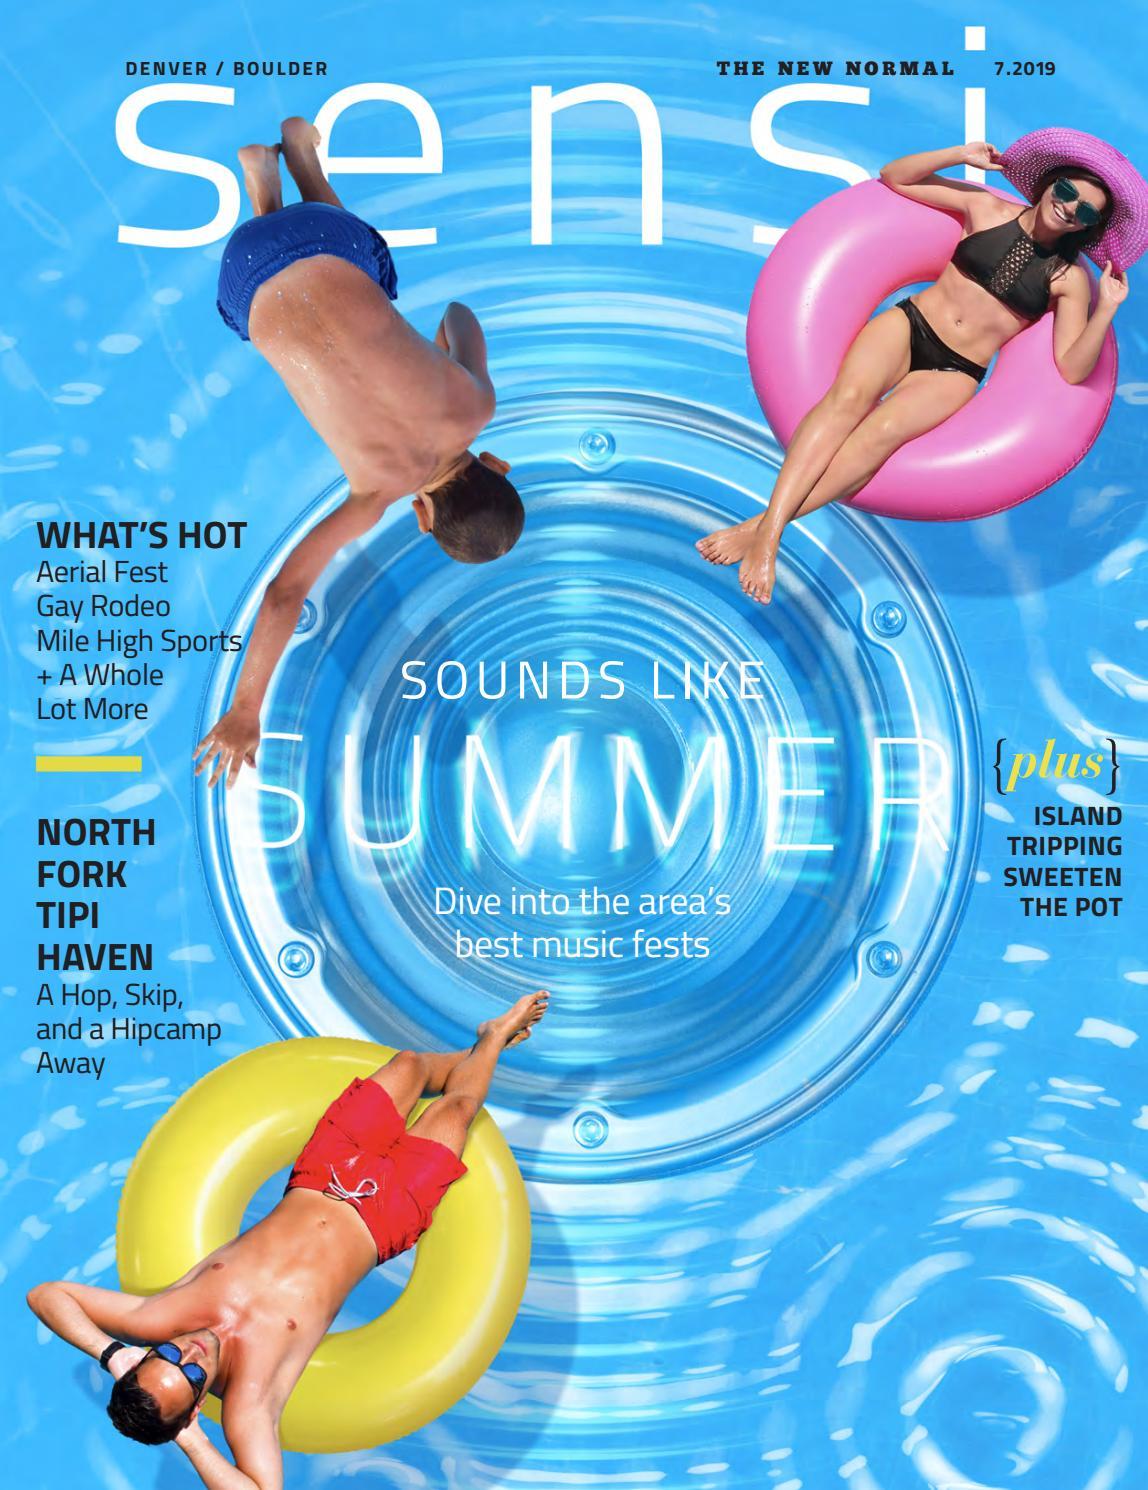 Living The Life Of A Noob Loud 400 Sales Roblox Id Sensi Magazine Denver Boulder July 2019 By Sensi Magazine Issuu